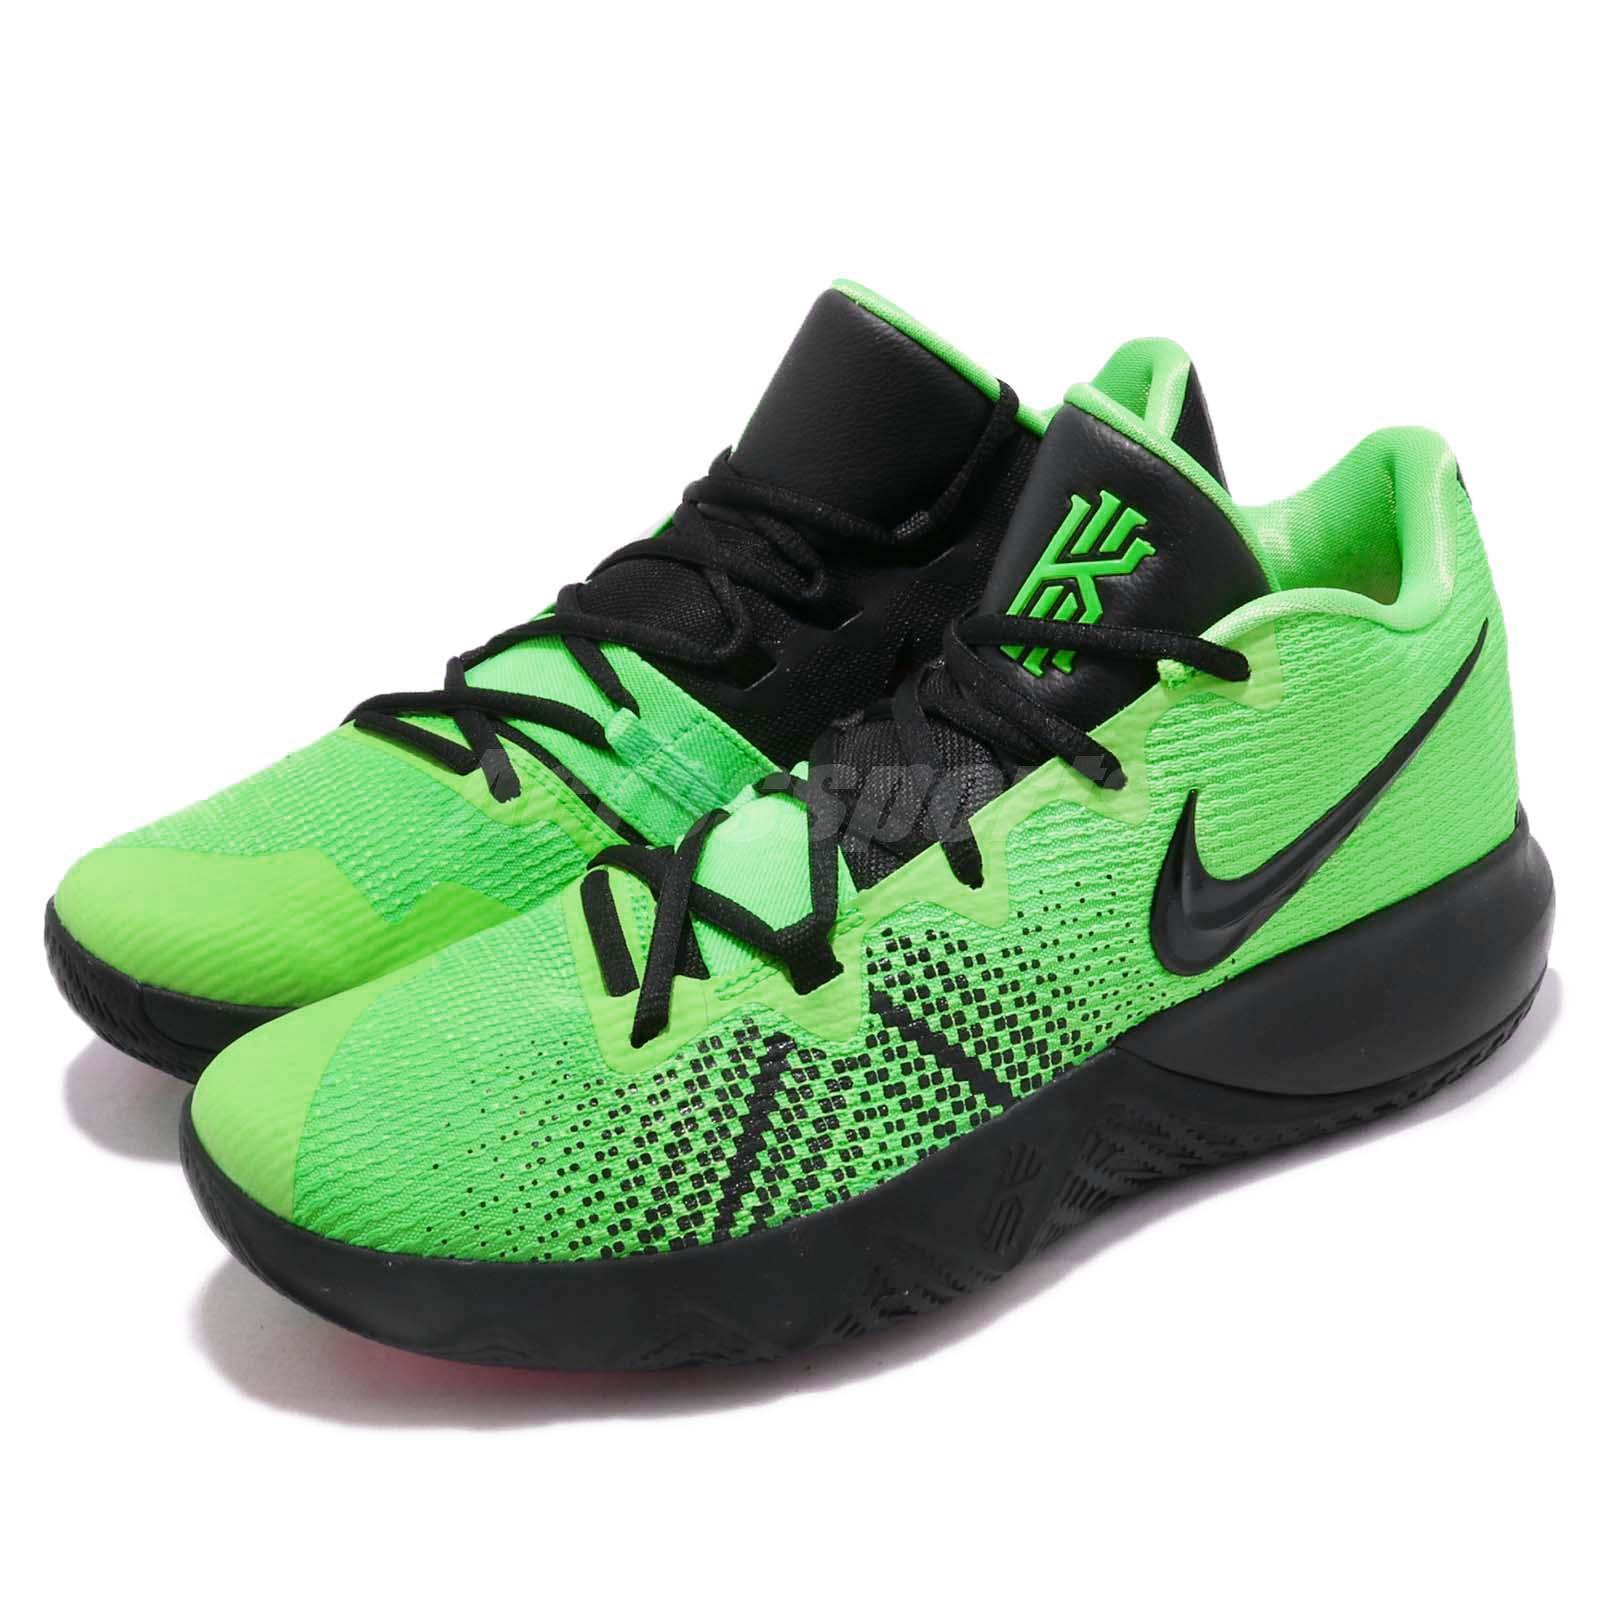 aec74ea472b Details about Nike Kyrie Flytrap EP Irving Rage Green Black Men Basketball  Shoes AJ1935-300